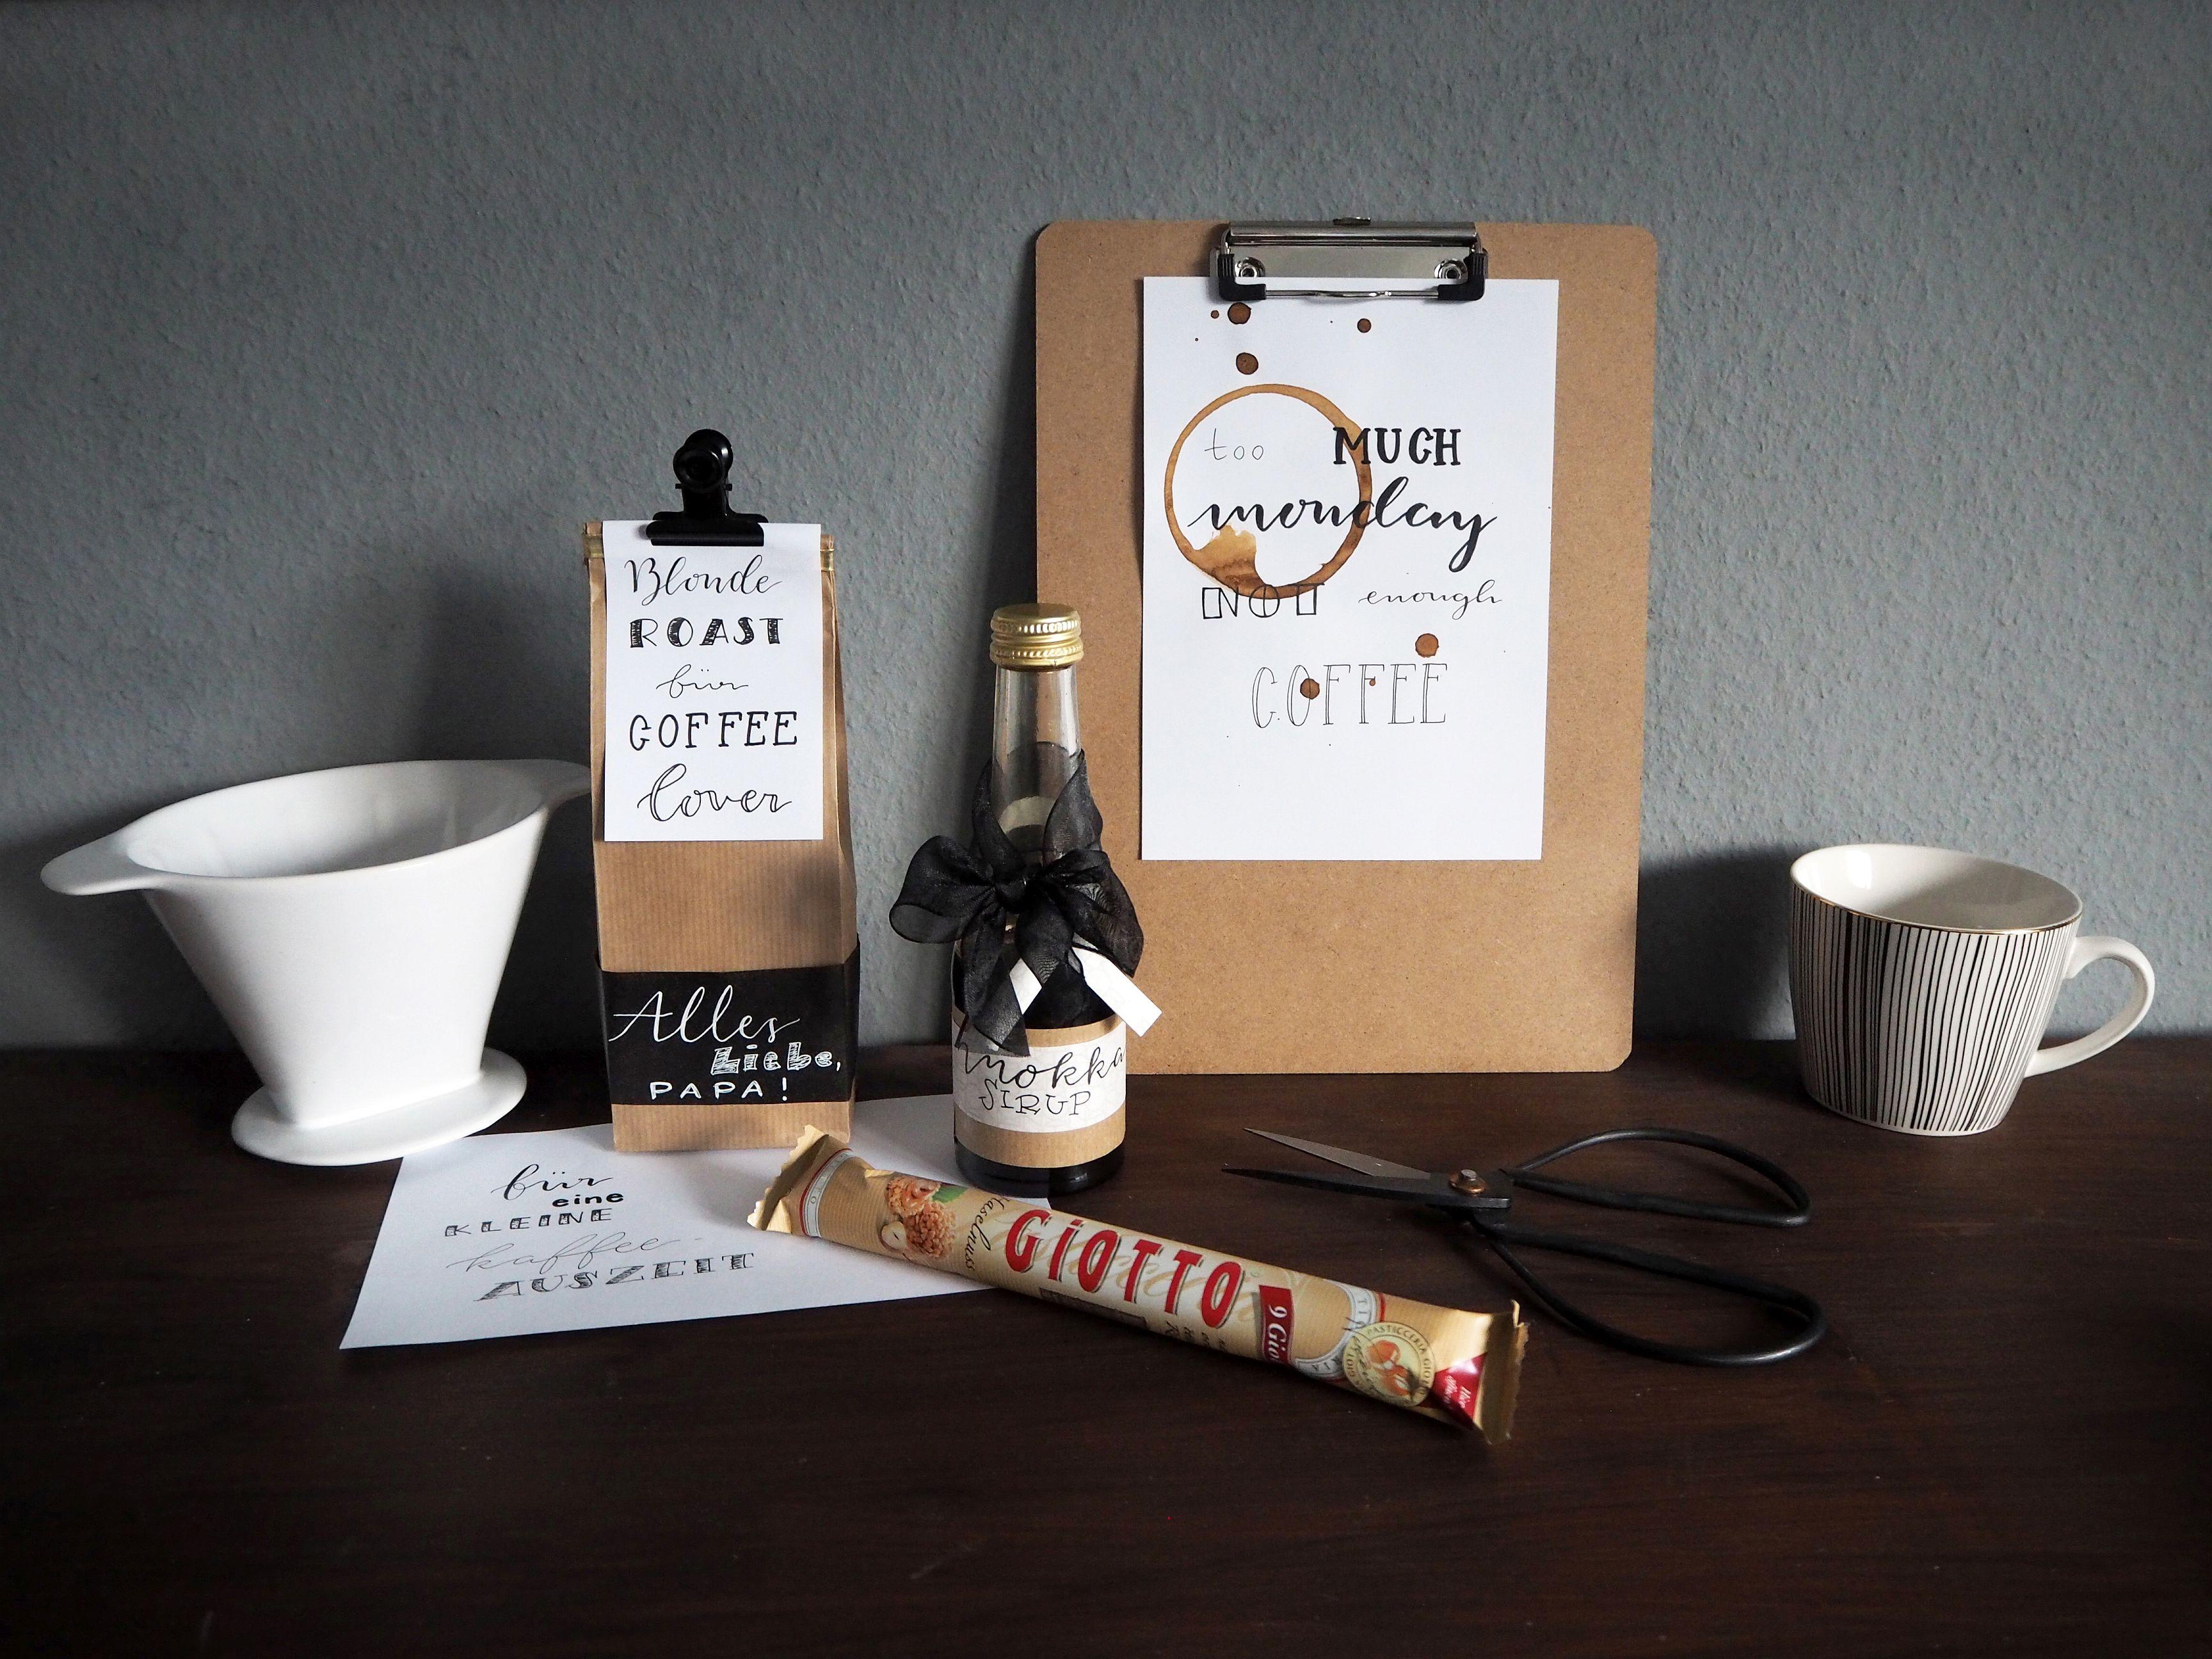 2018-05-skoen-och-kreativ-diy-lettering-set-fuer-kaffee-auszeit-zum-vatertag (1)